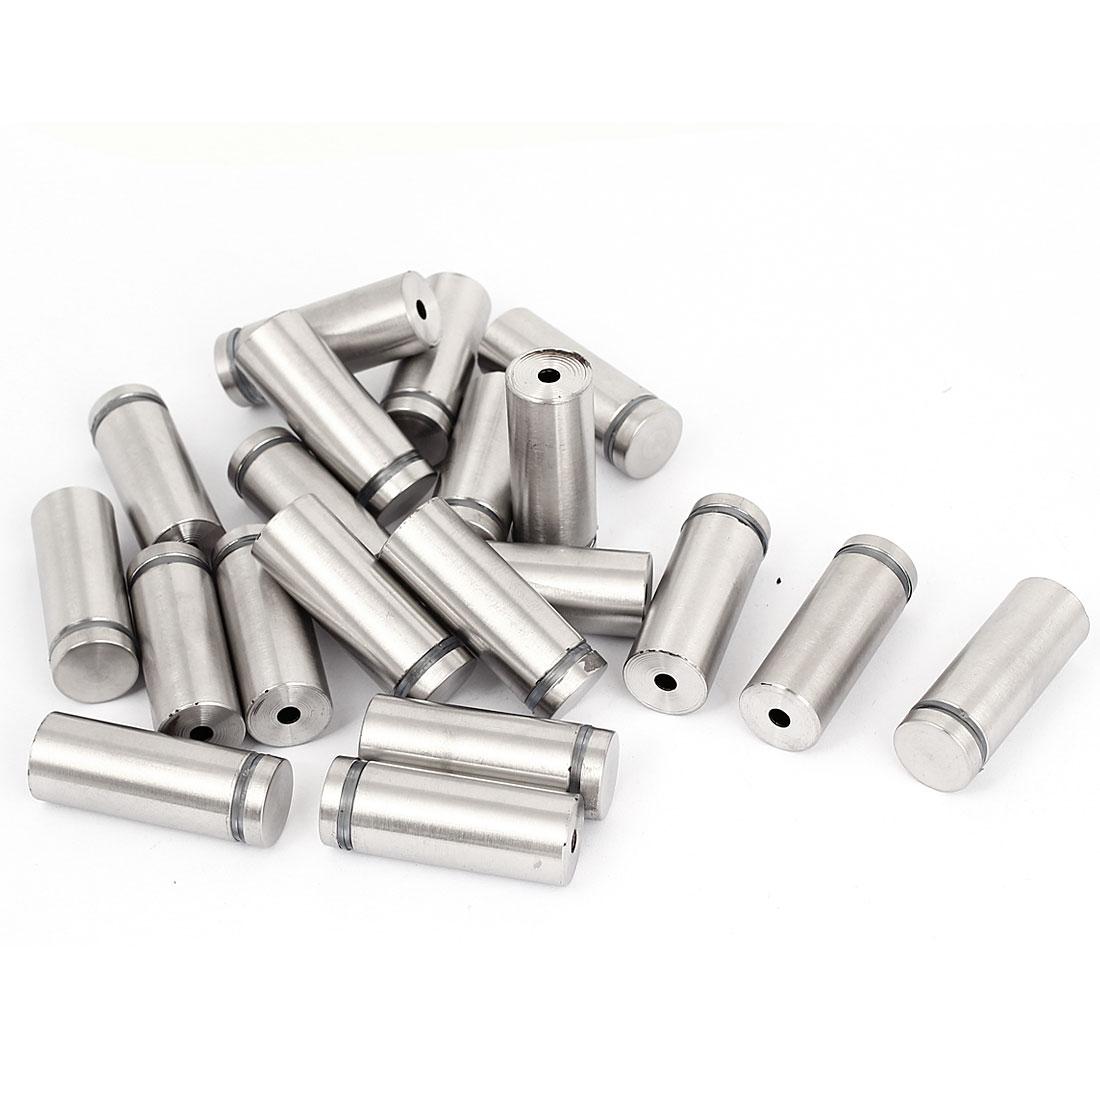 19mm x 50mm Stainless Steel Advertising Frameless Glass Standoff Pins 20pcs